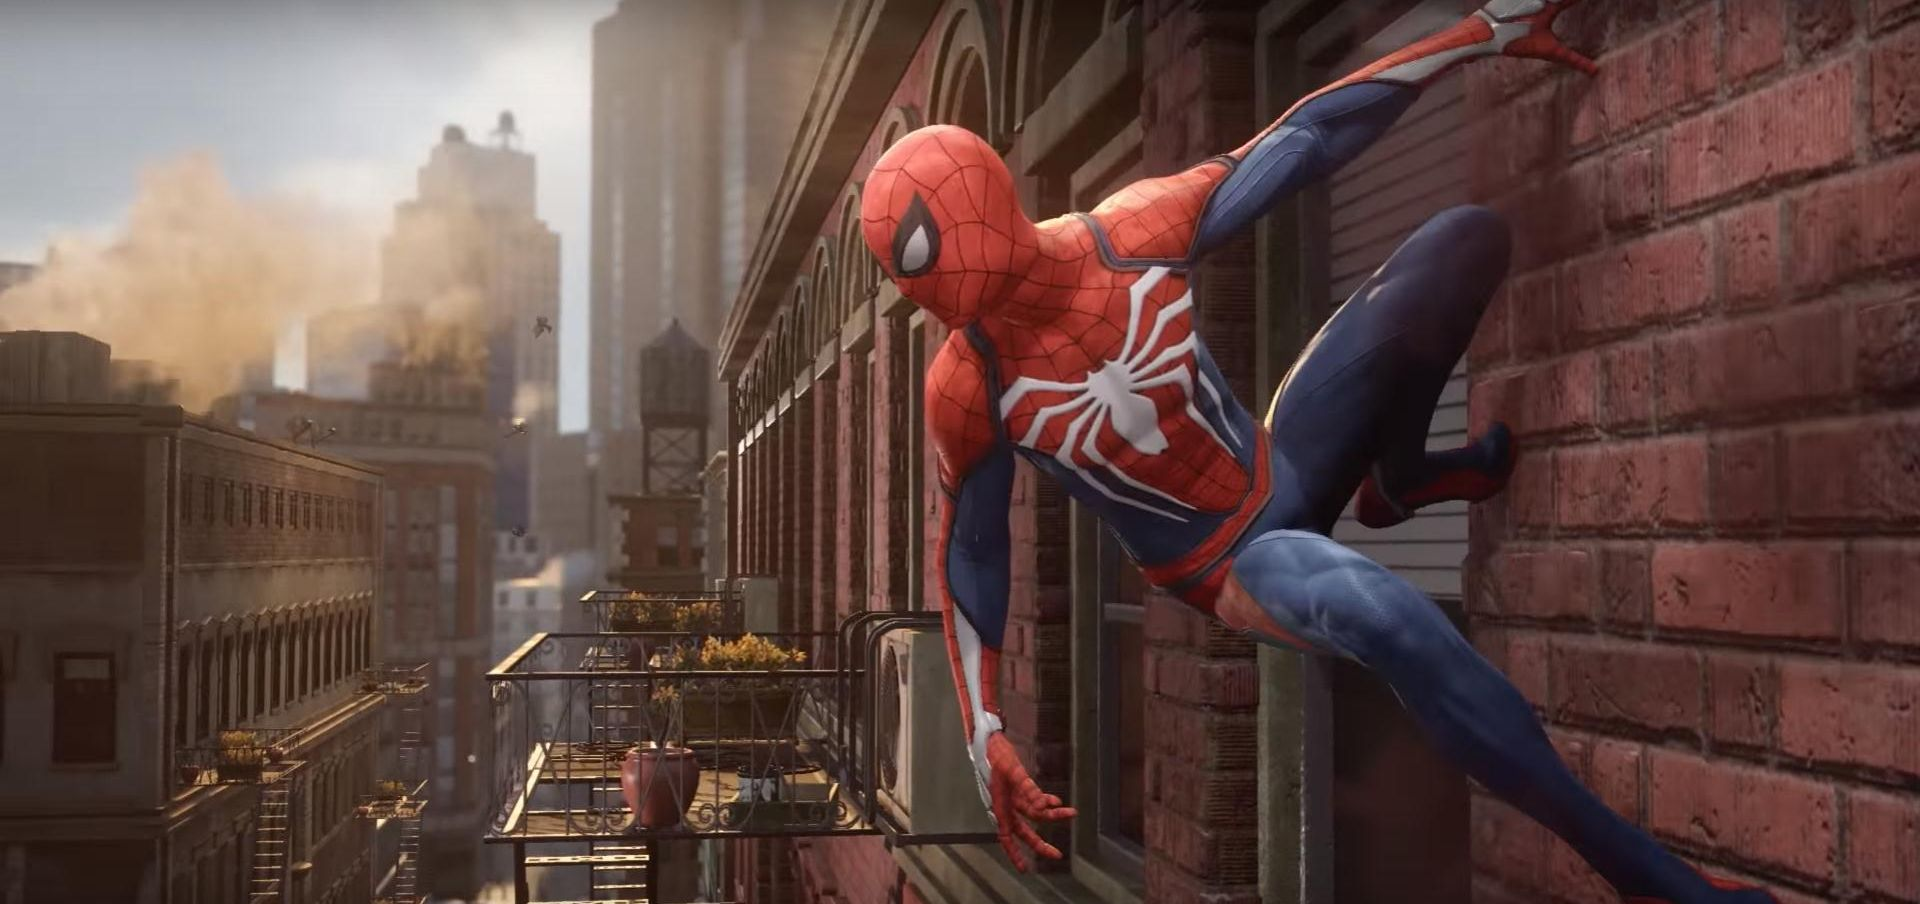 VIDEO: Nova igrica o Spidermanu dolazi na PlayStation 4